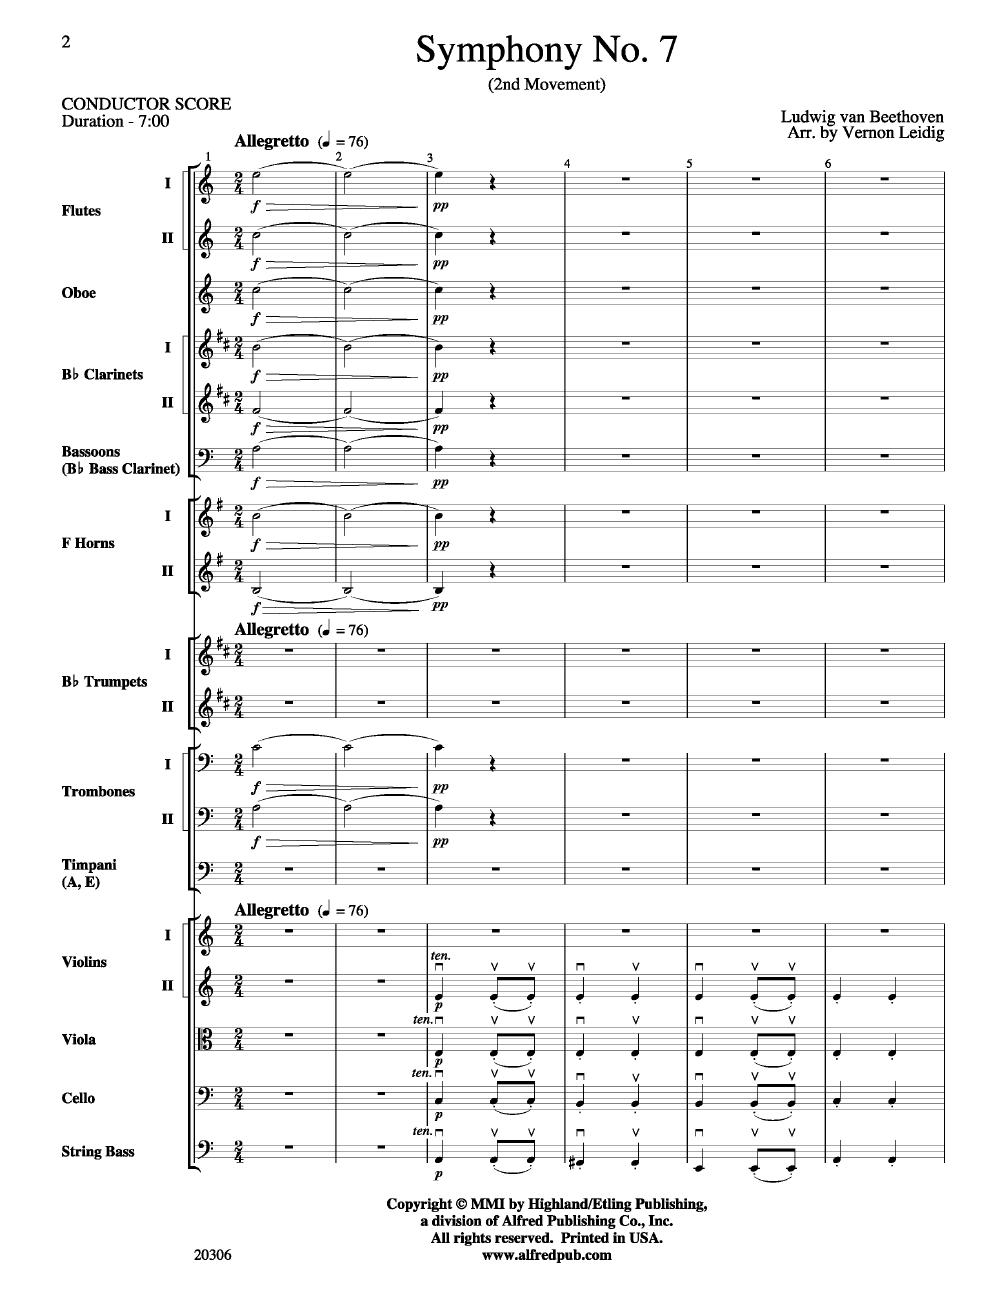 beethoven symphony no 7 second movement